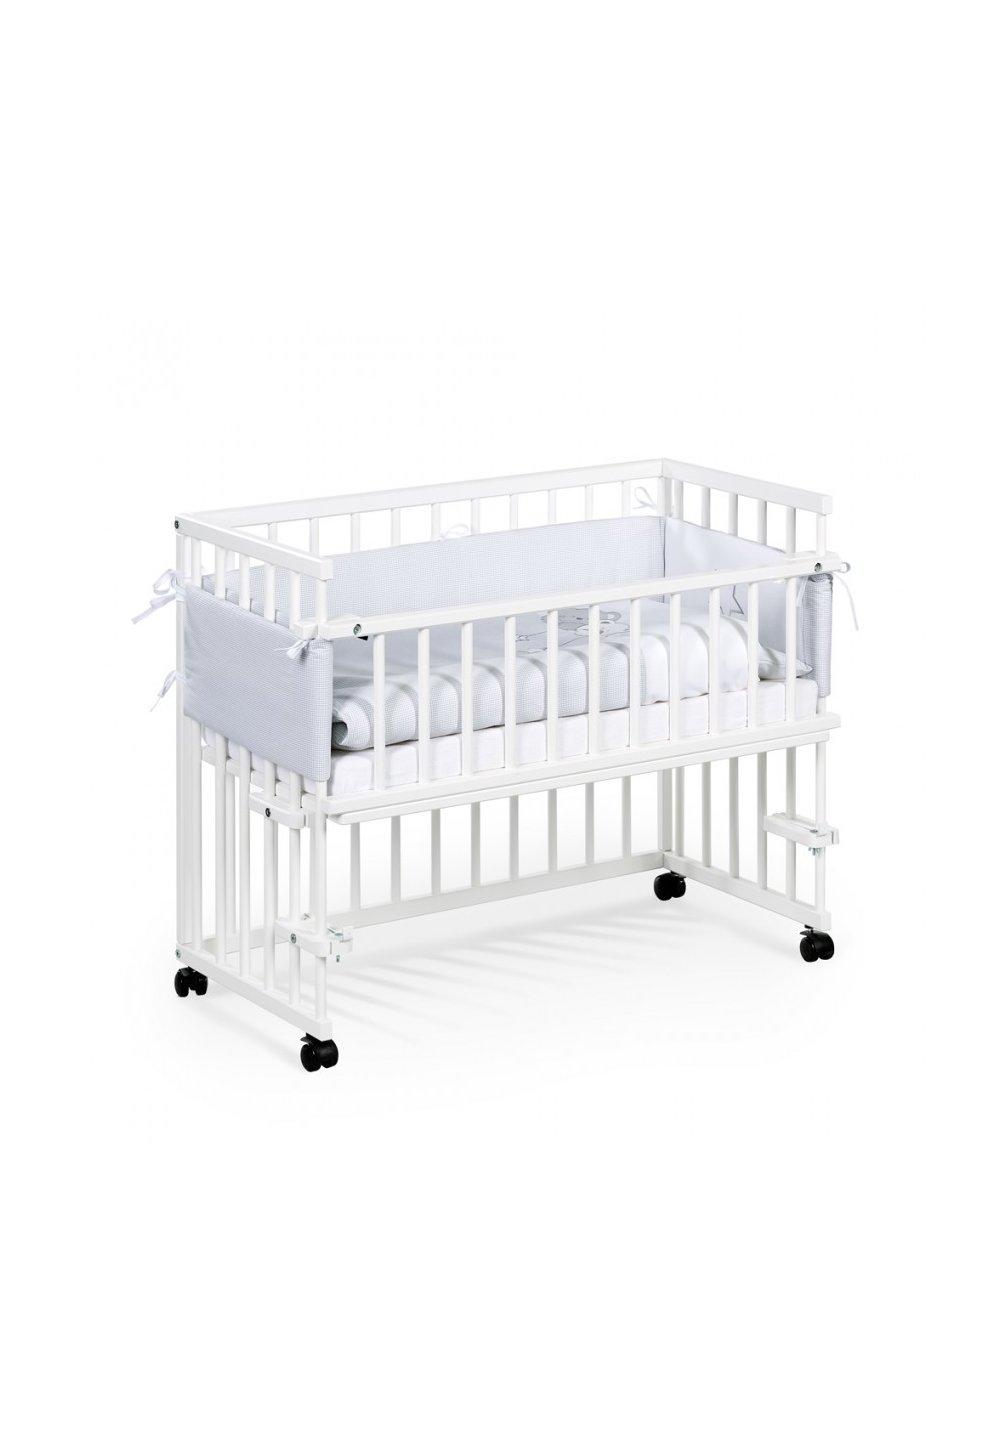 Patut bebe, lemn, Piccolo, alb , 95x45 cm + Saltea patut, Picolo,90x45 cm imagine